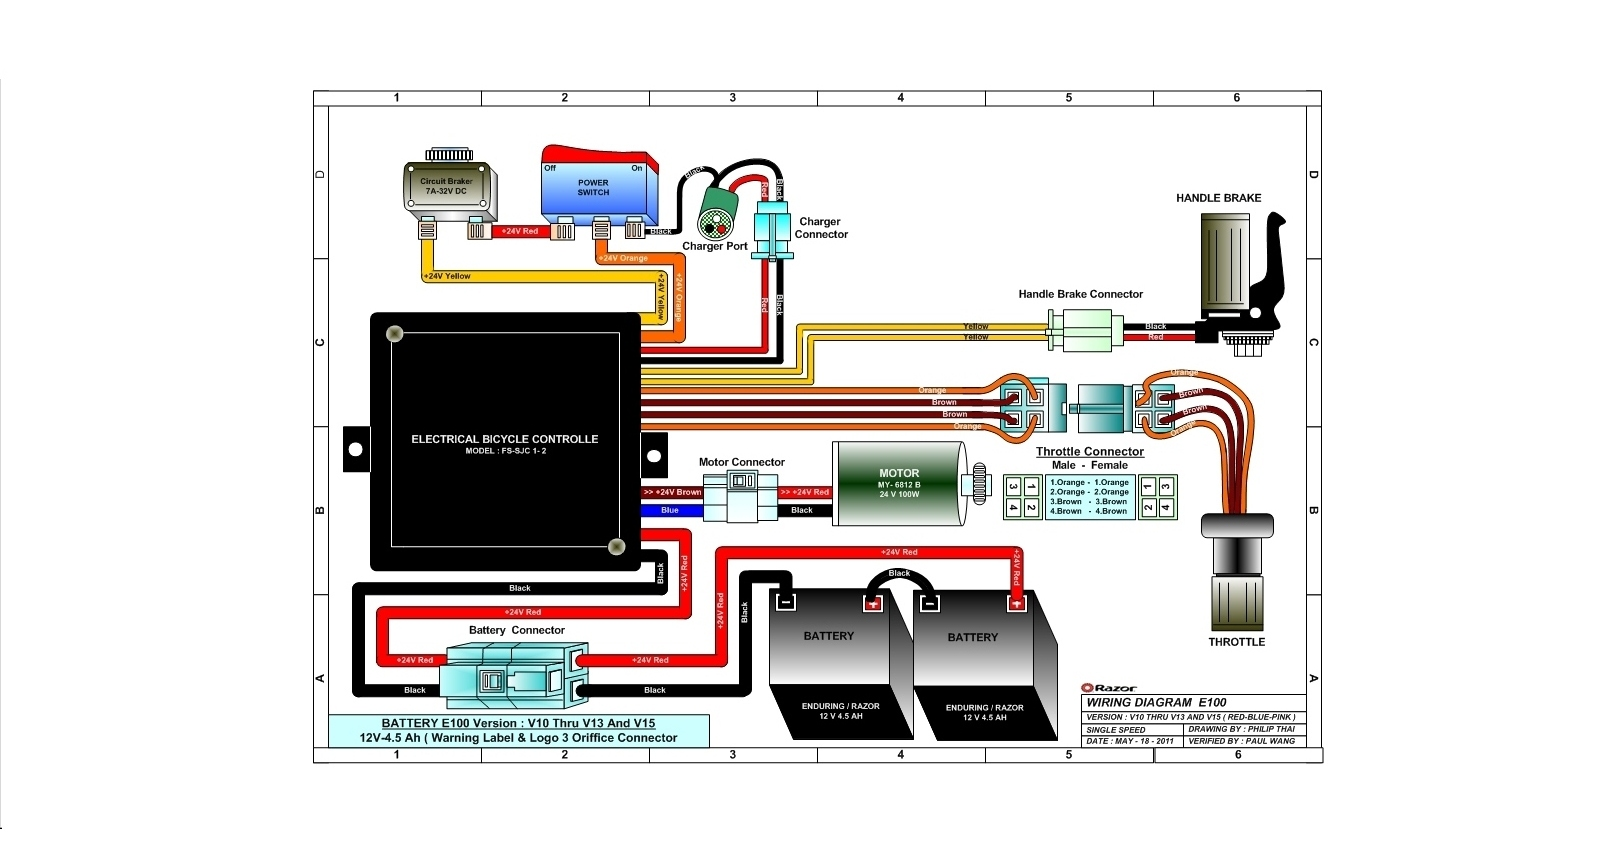 color wiring diagrams visio data flow diagram example razor manuals e100 versions 10 13 15